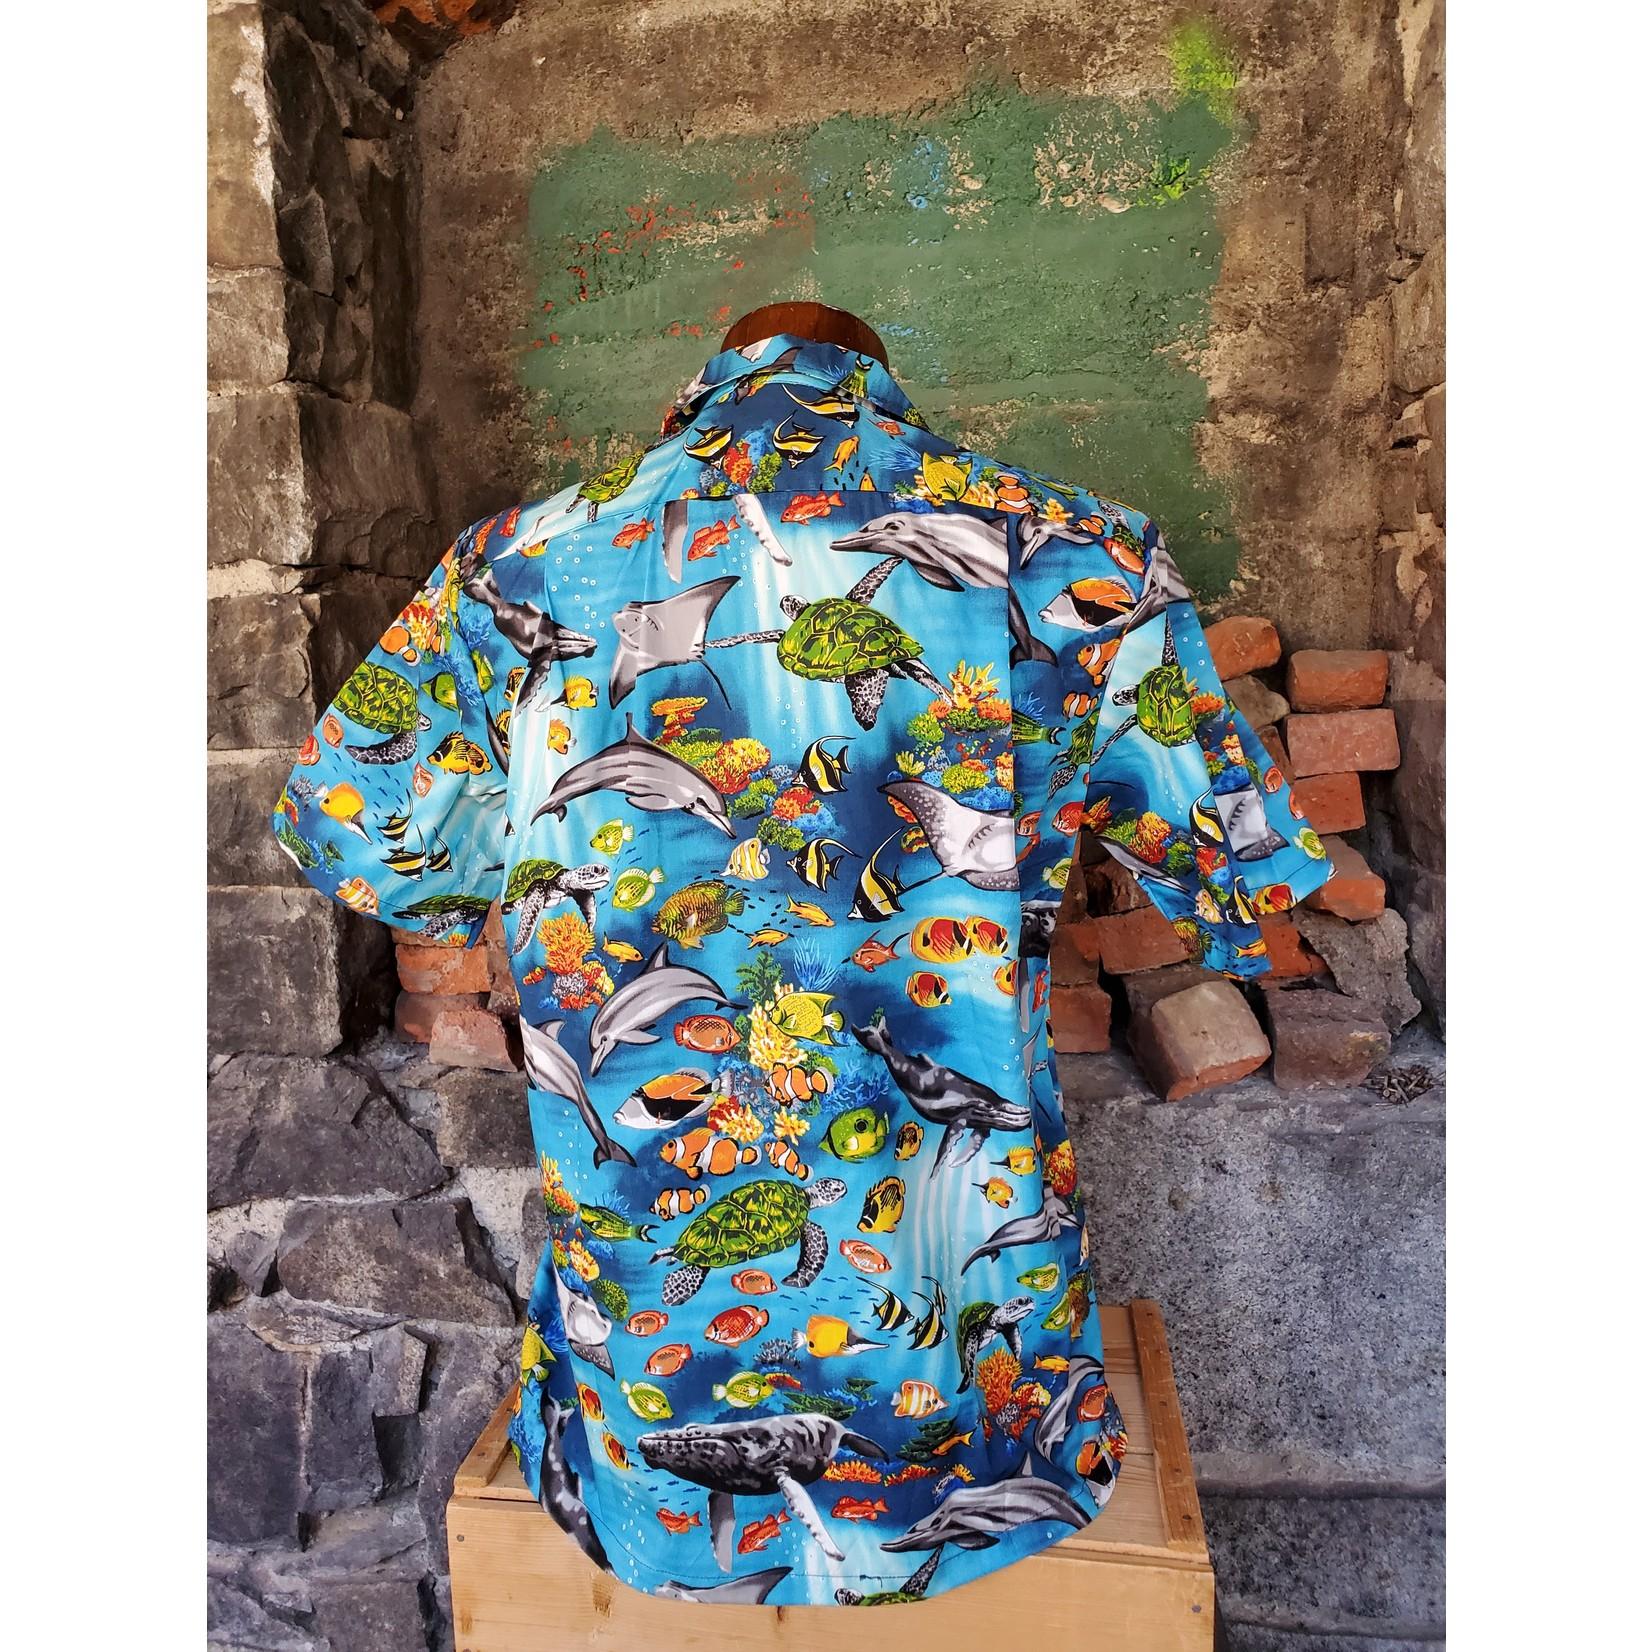 RJC Authentic Hawaiian Shirt - Under the Sea